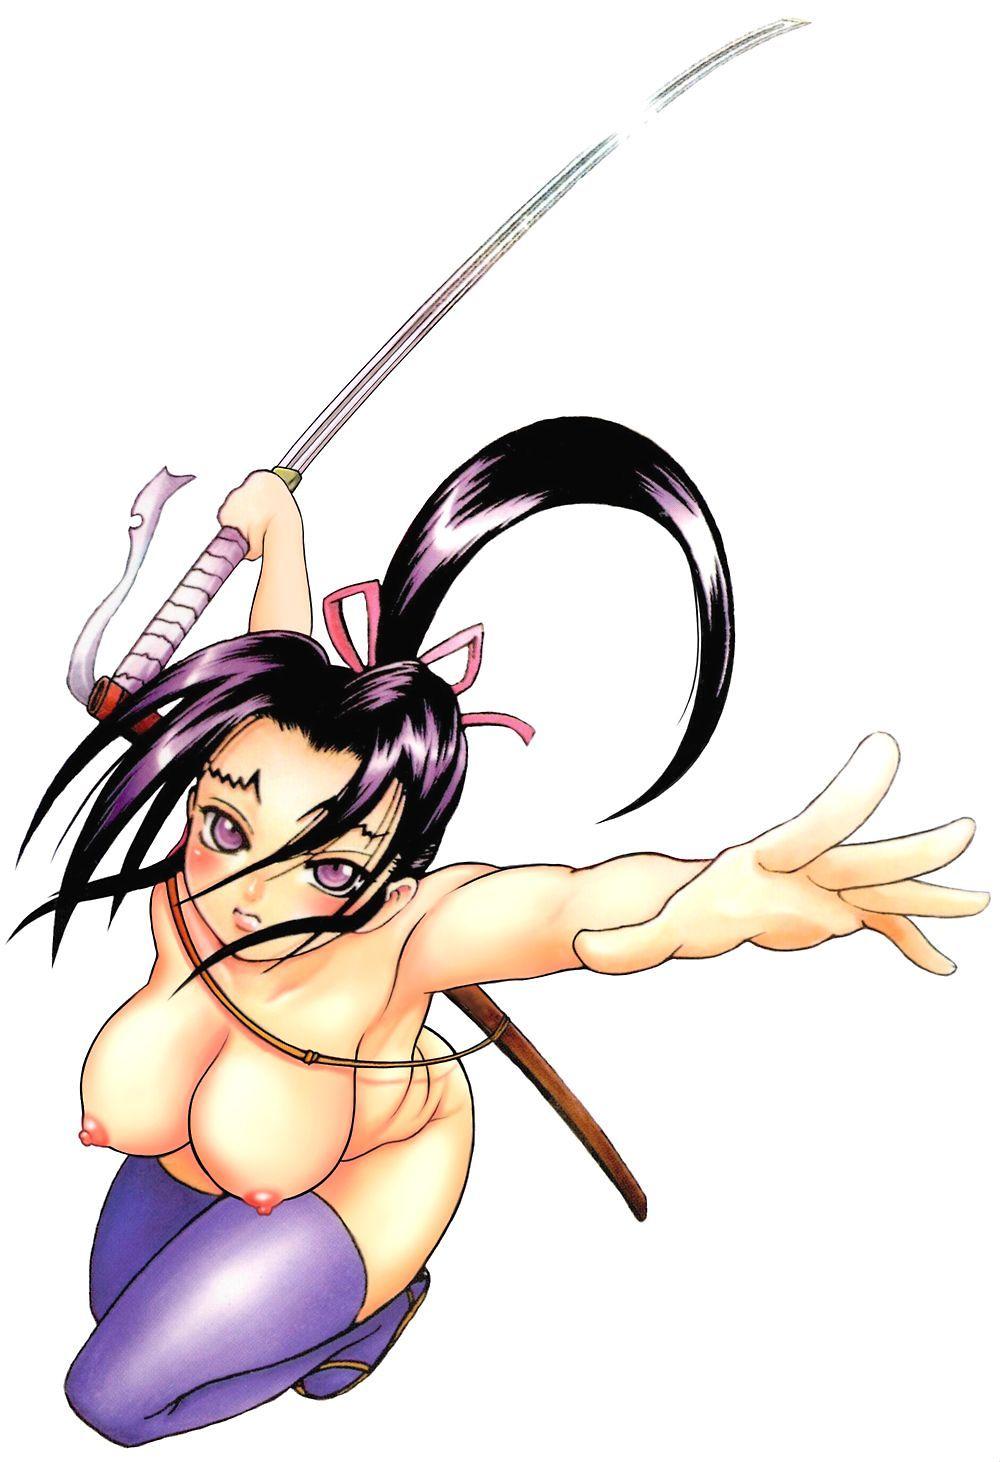 mightiest shigure the kosaka kenichi disciple Divinity original sin charmed orc